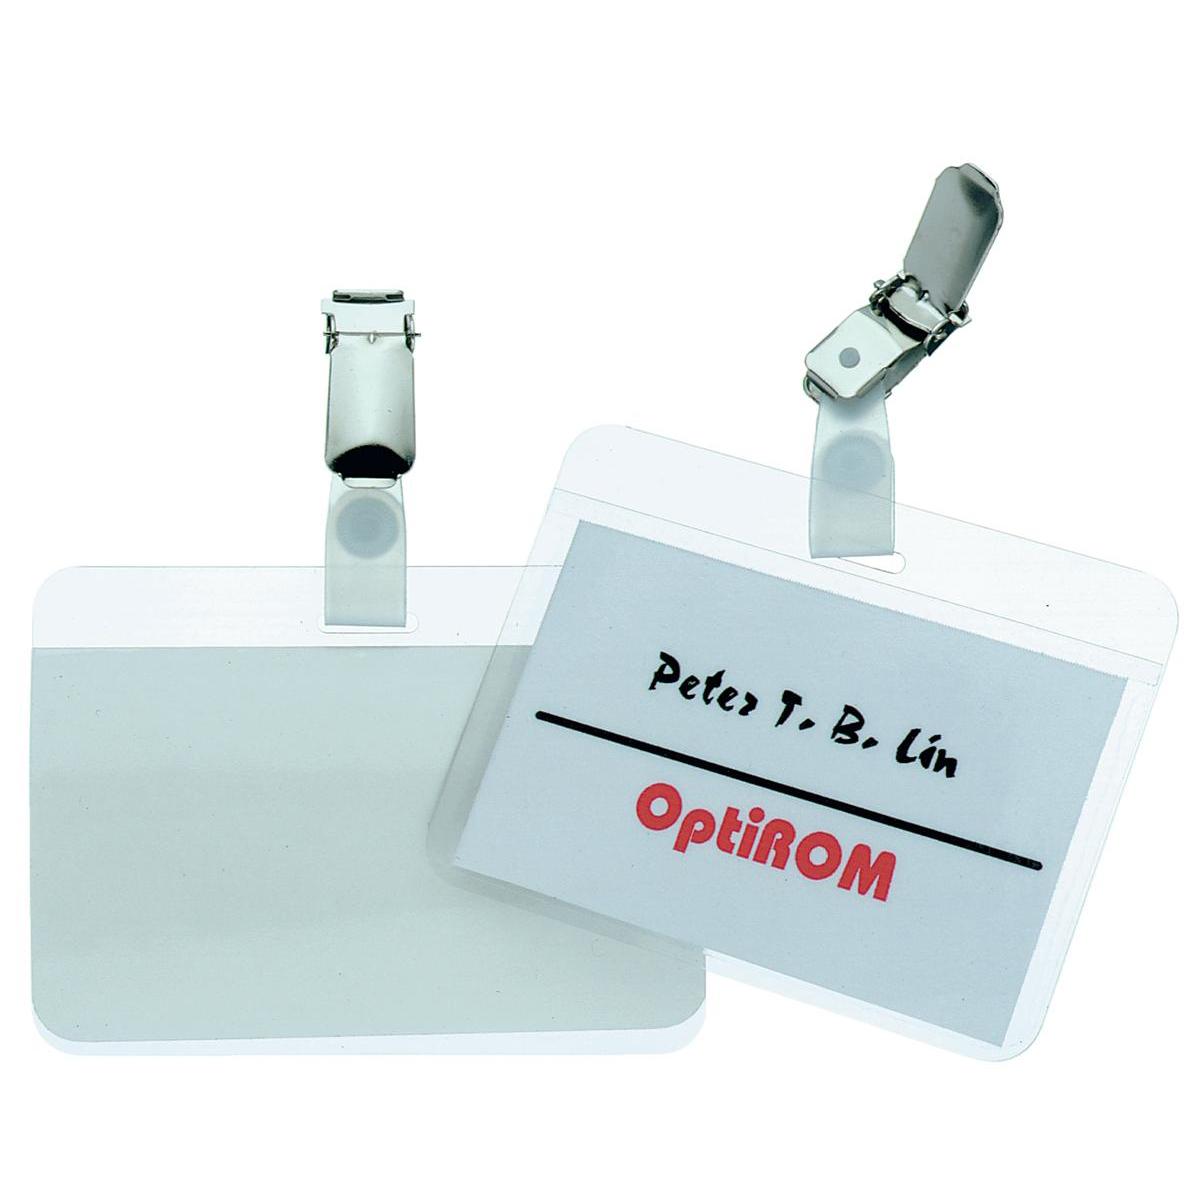 Durable Name Badges Self Laminating Self Adhesive W90xH54mm Transparent Ref 8102 Pack 25